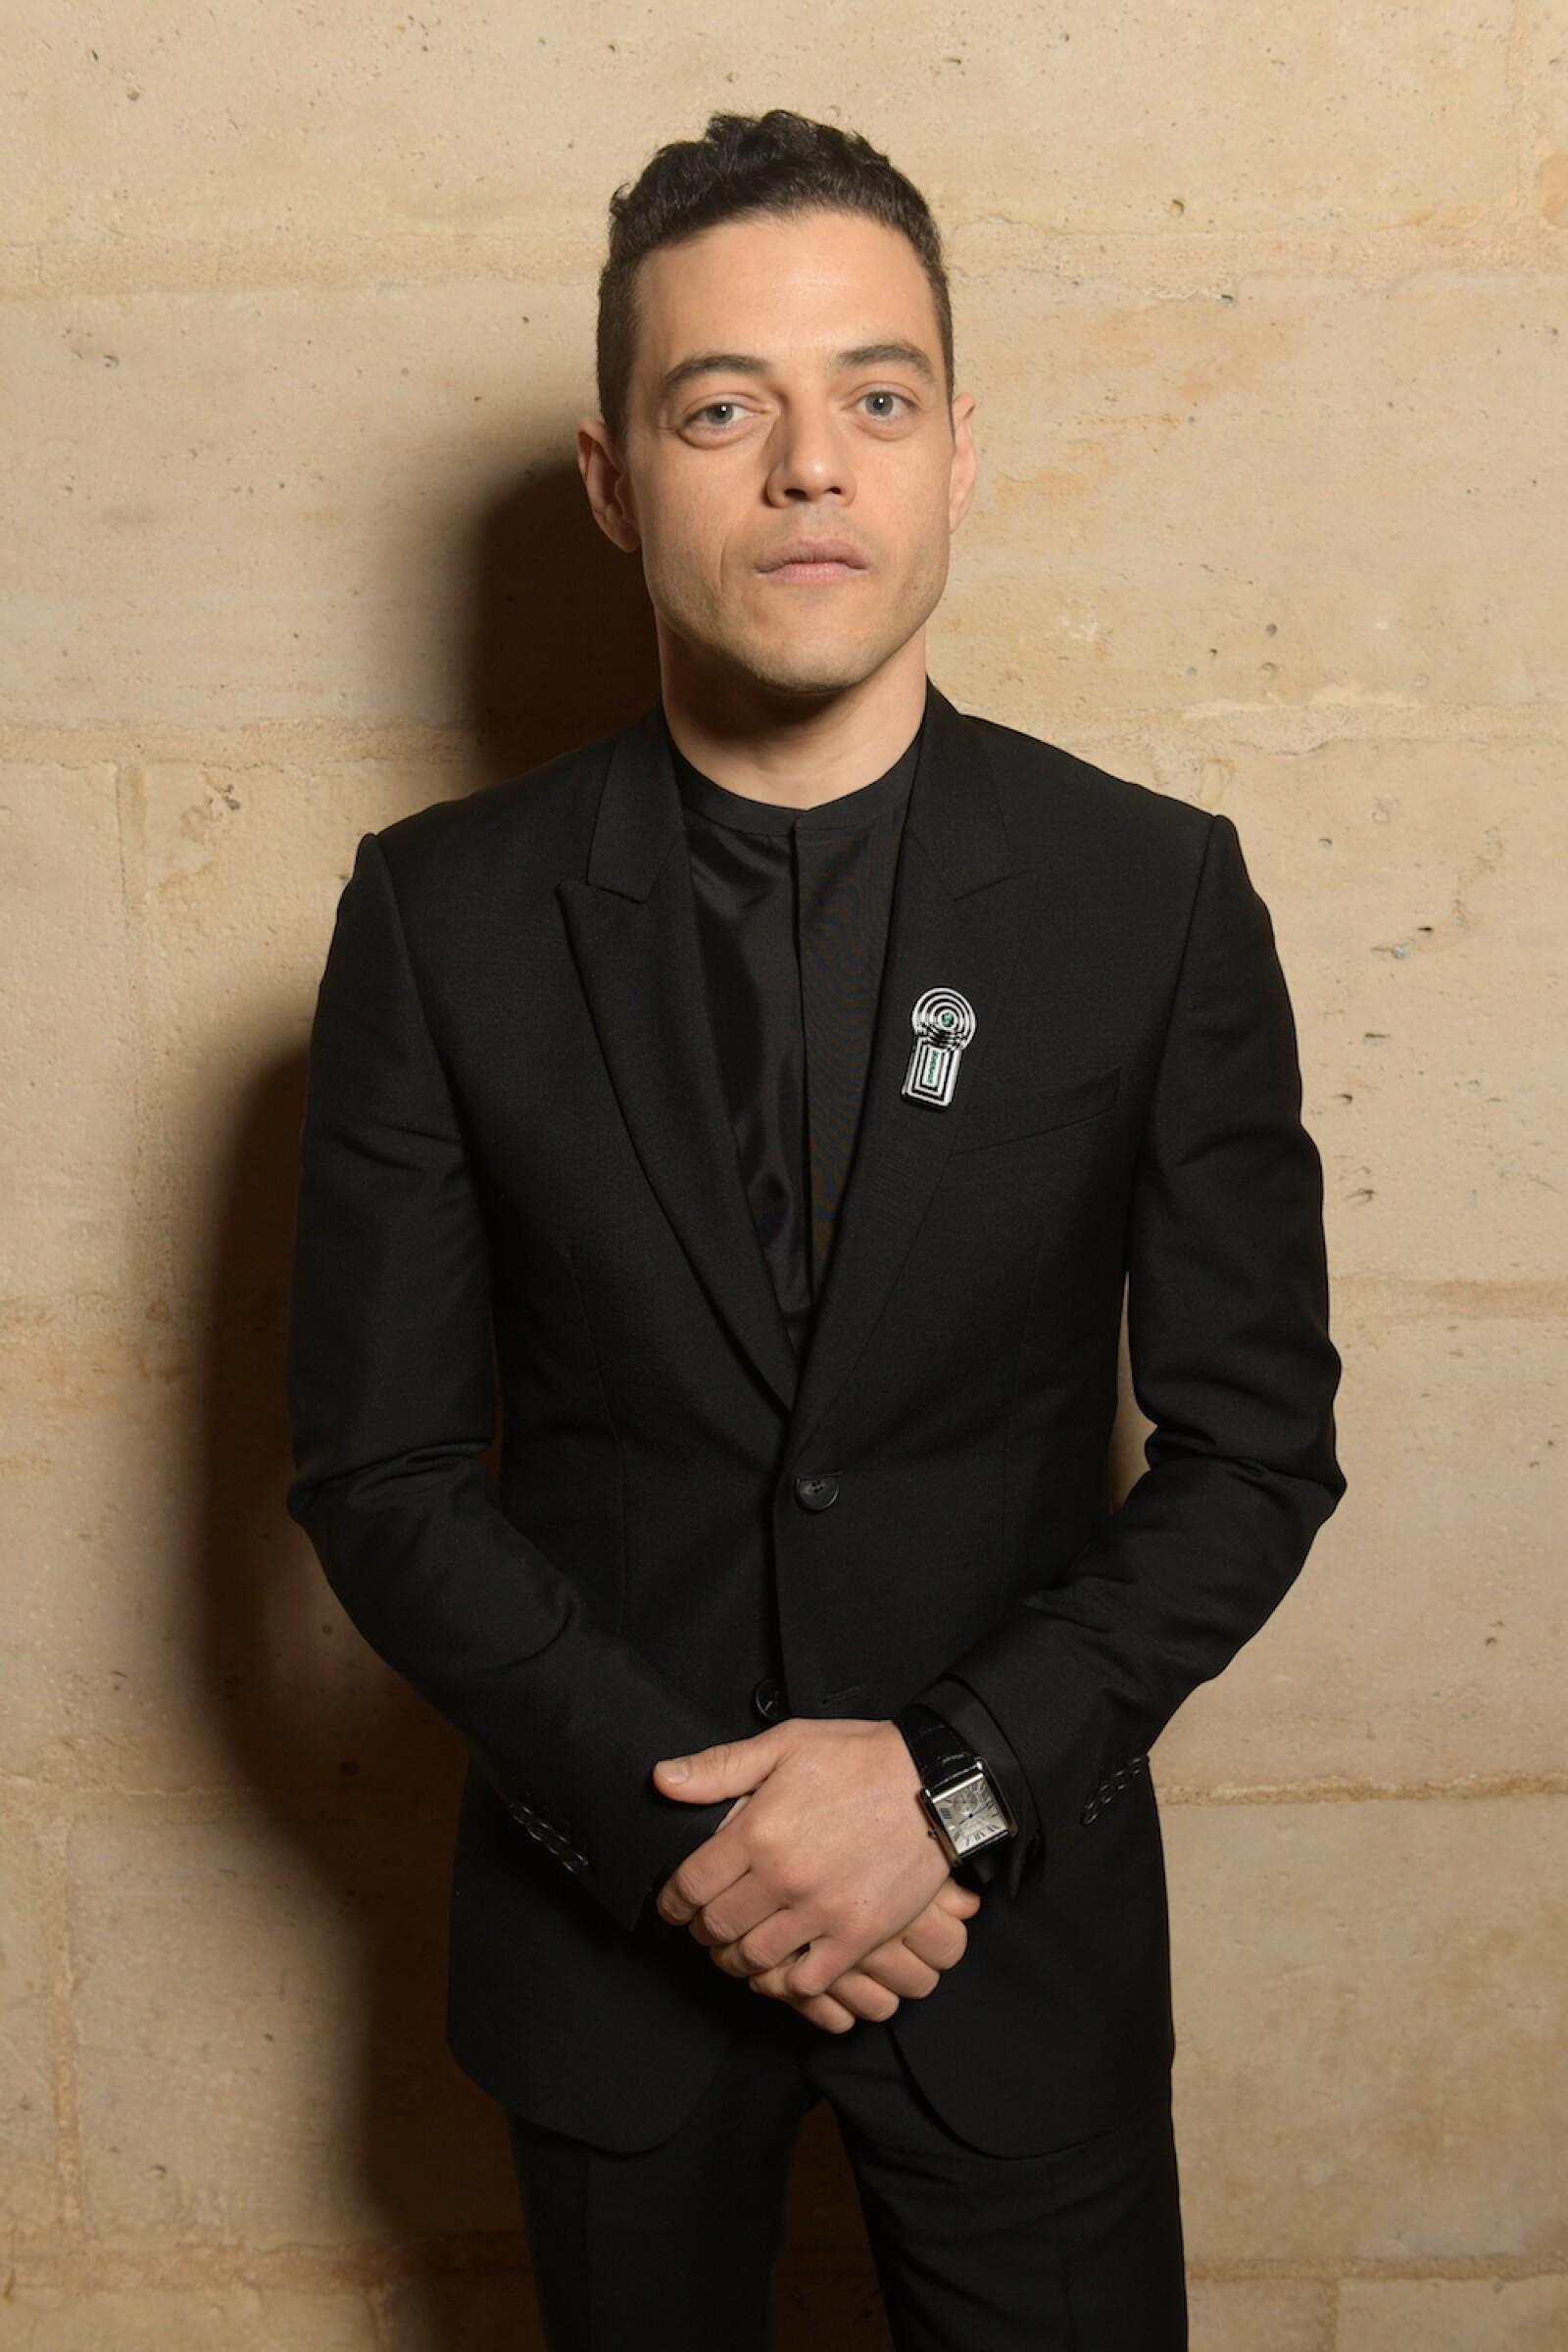 El ganador del Oscar Rami Malek optó por un look total black